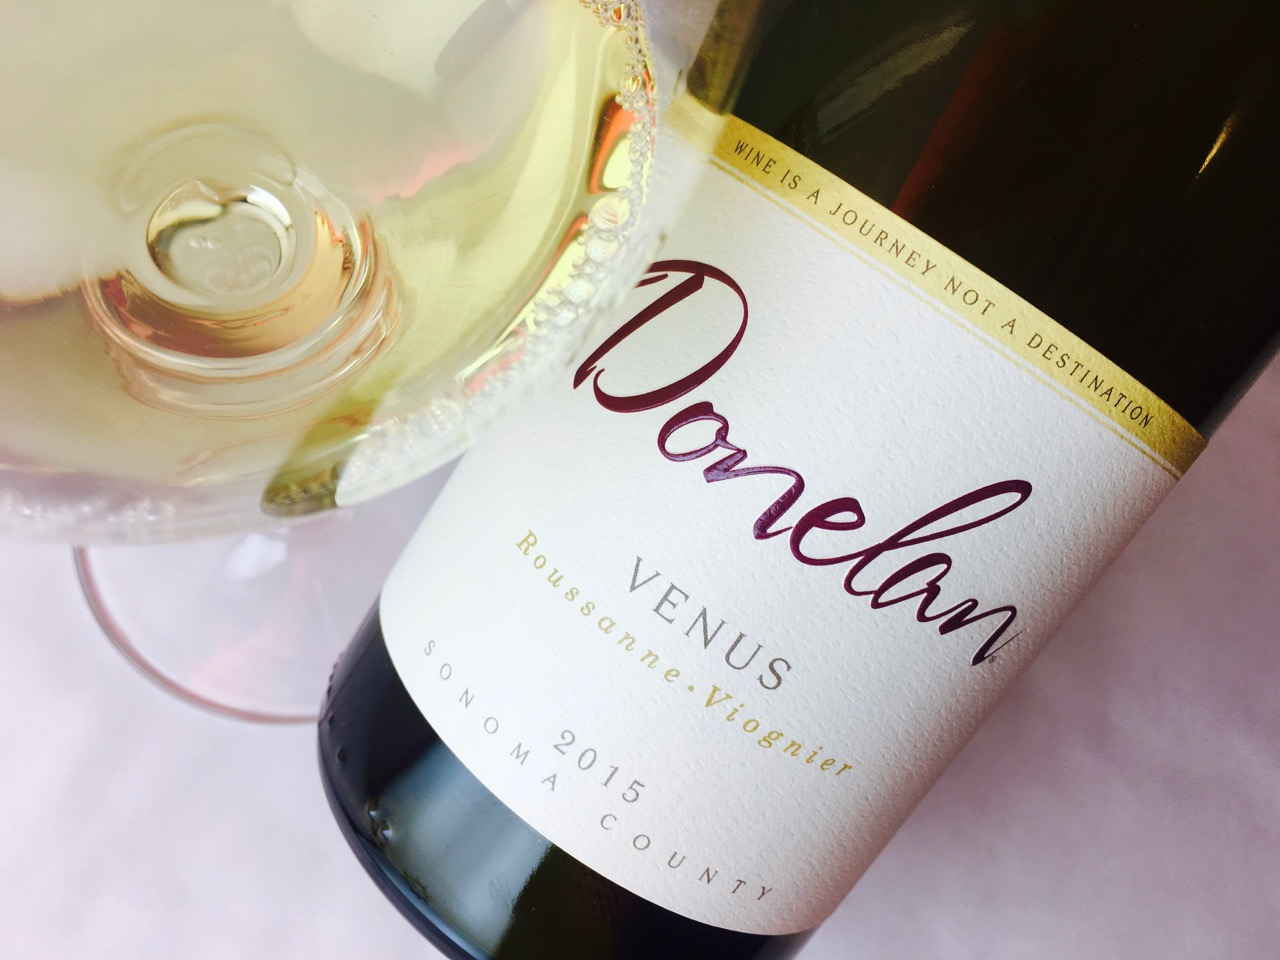 2015 Donelan Venus Roussanne-Viognier Sonoma County